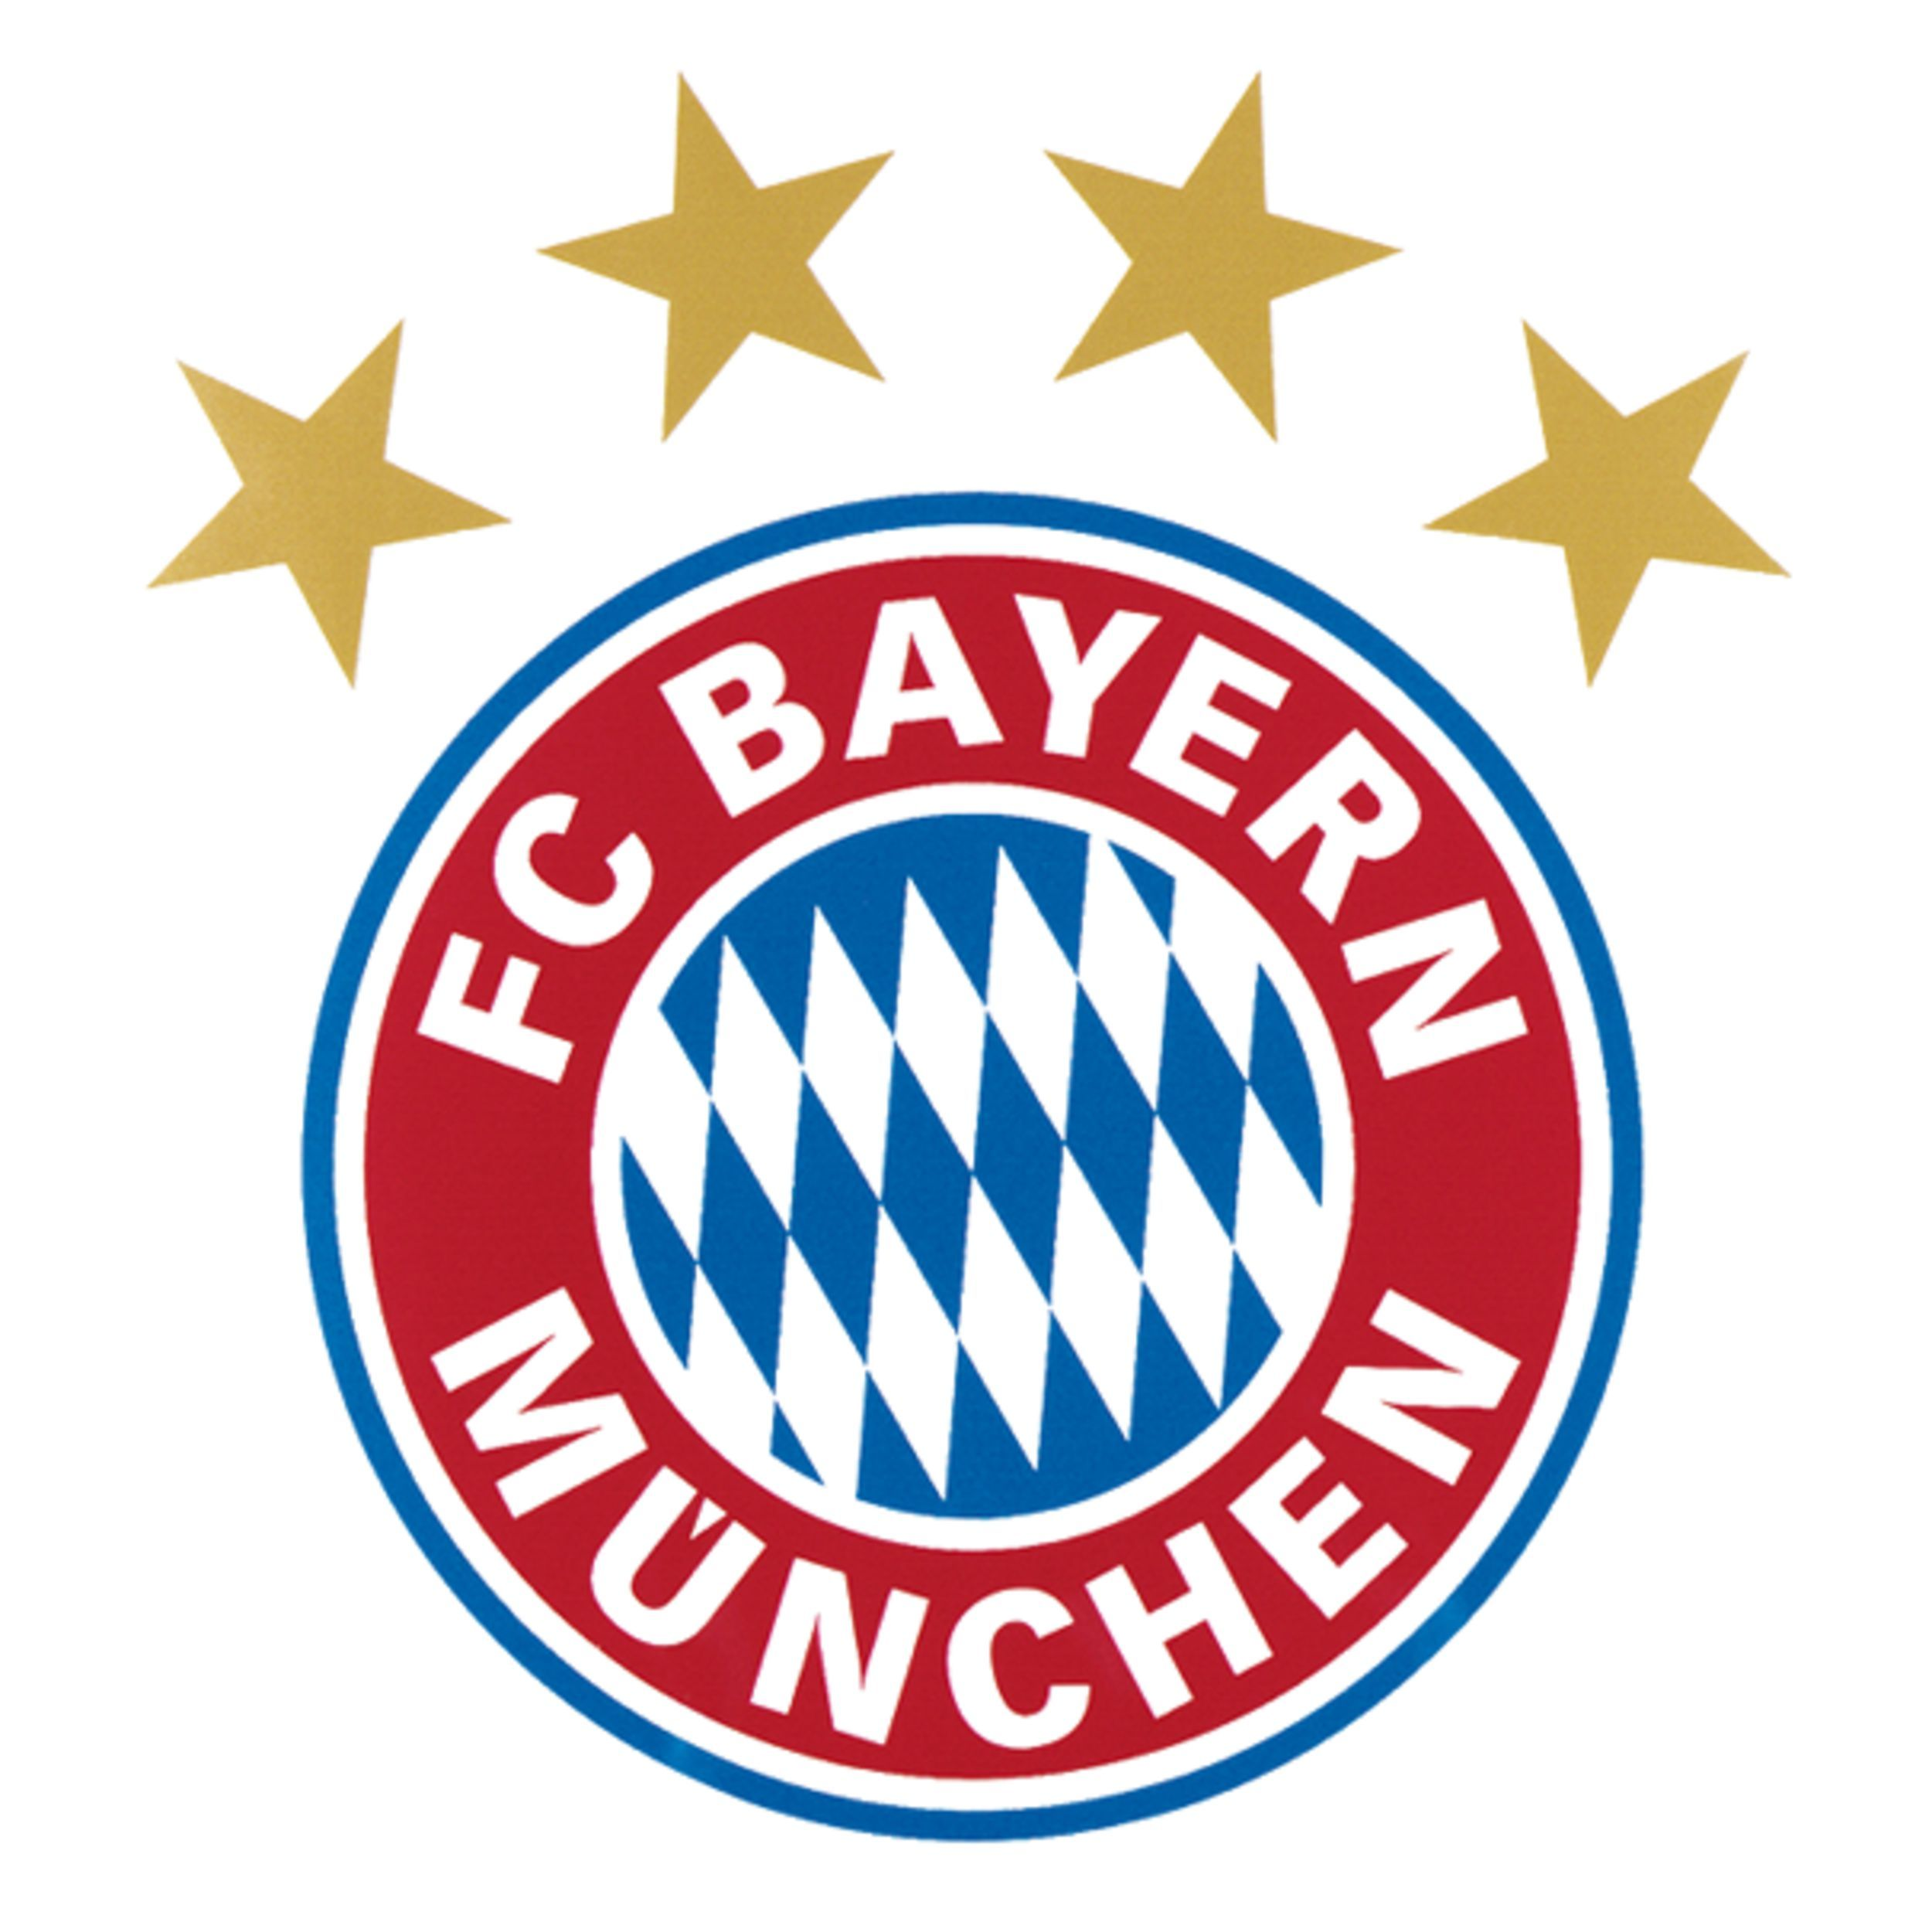 image logo bayern